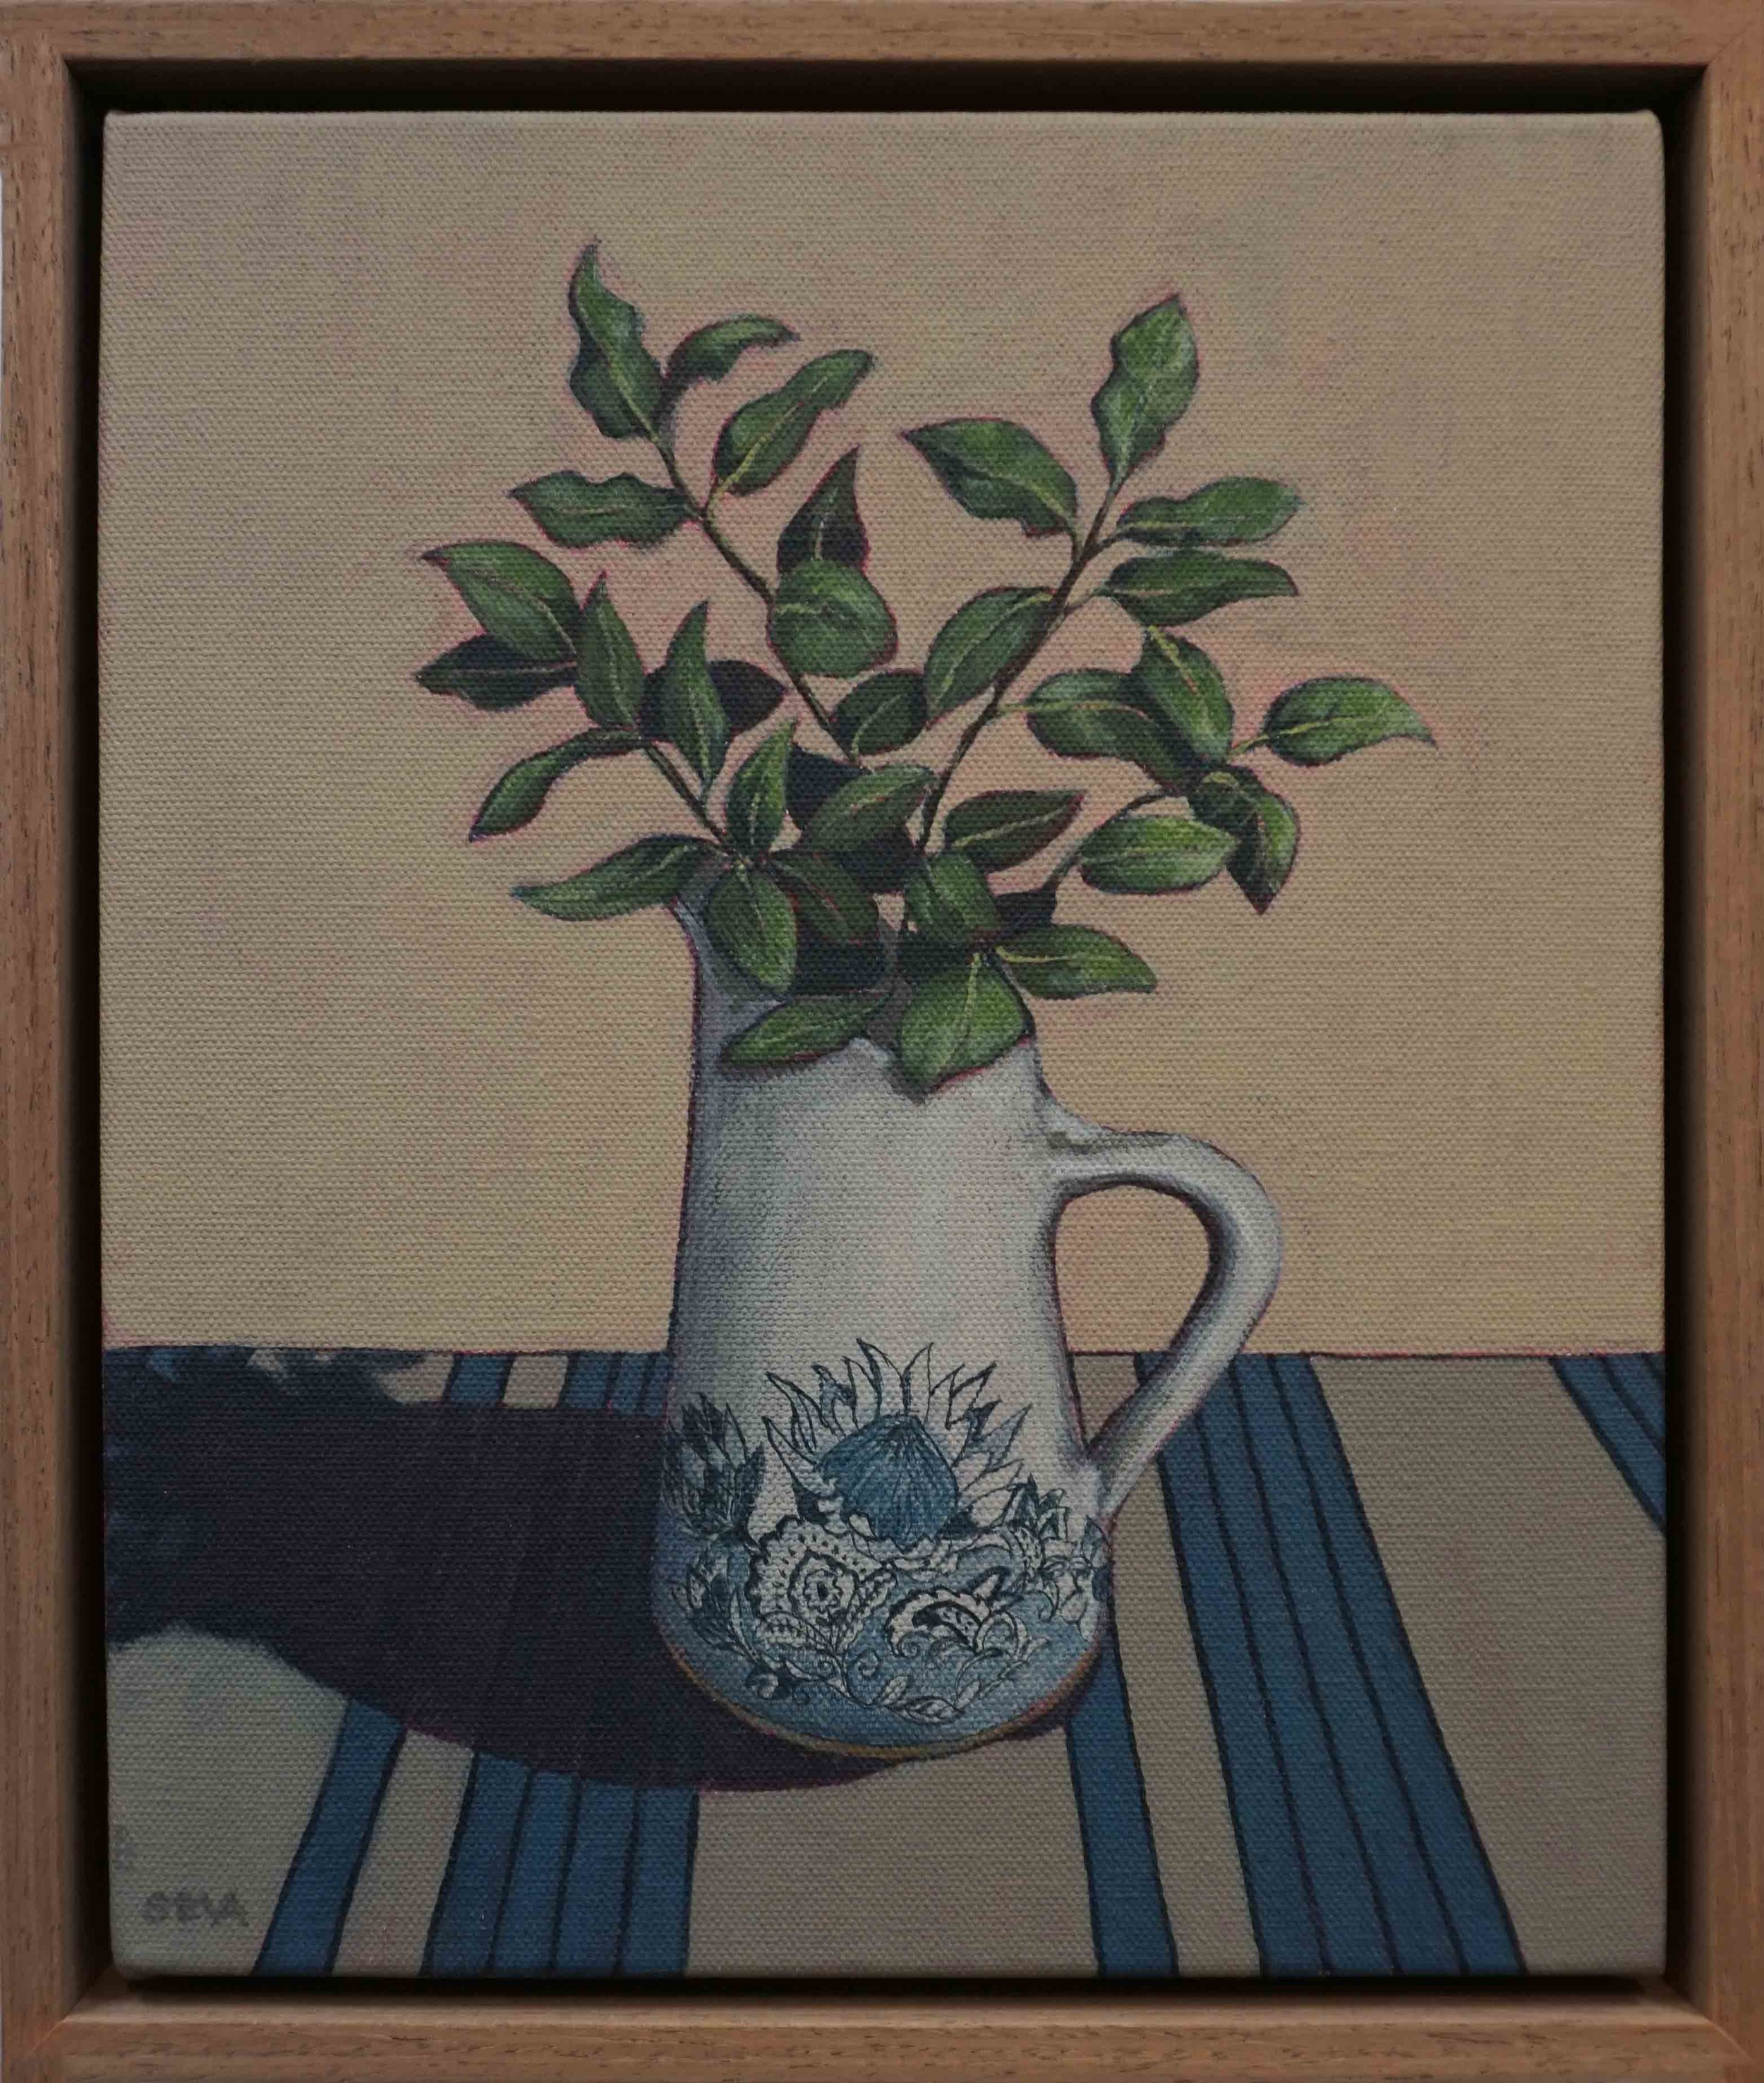 19. Sue Eva, 'The Town Jug', 2018, Acrylic on canvas, 30 x 25cm, $345